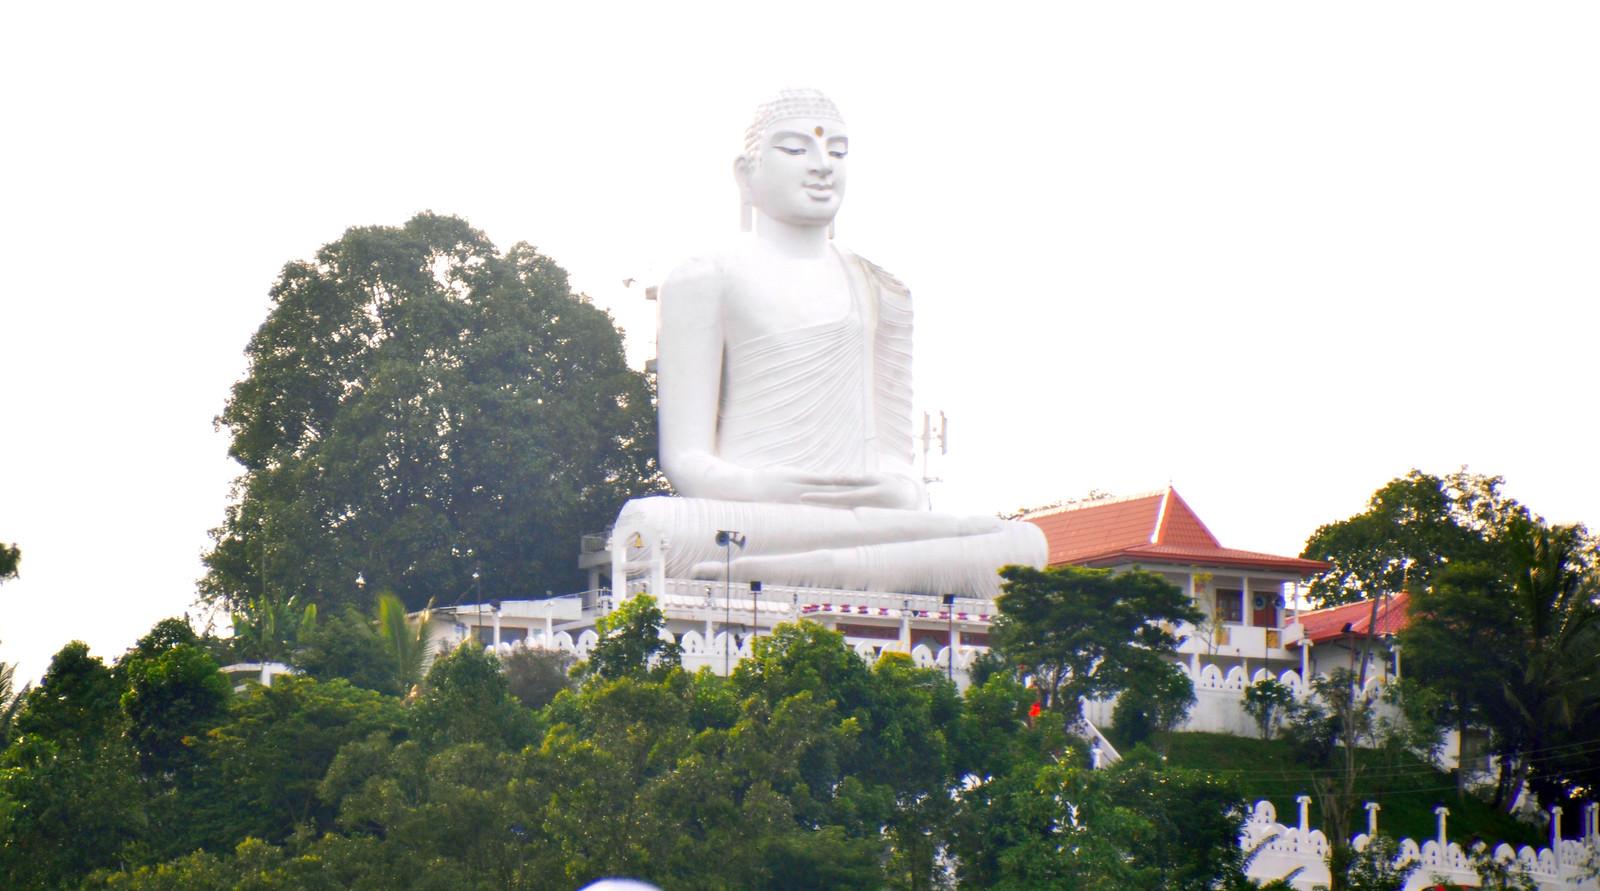 Kandy en un día, Sri Lanka kandy en un día - 46341678014 cf521cdb4b h - Kandy en un día, Sri Lanka